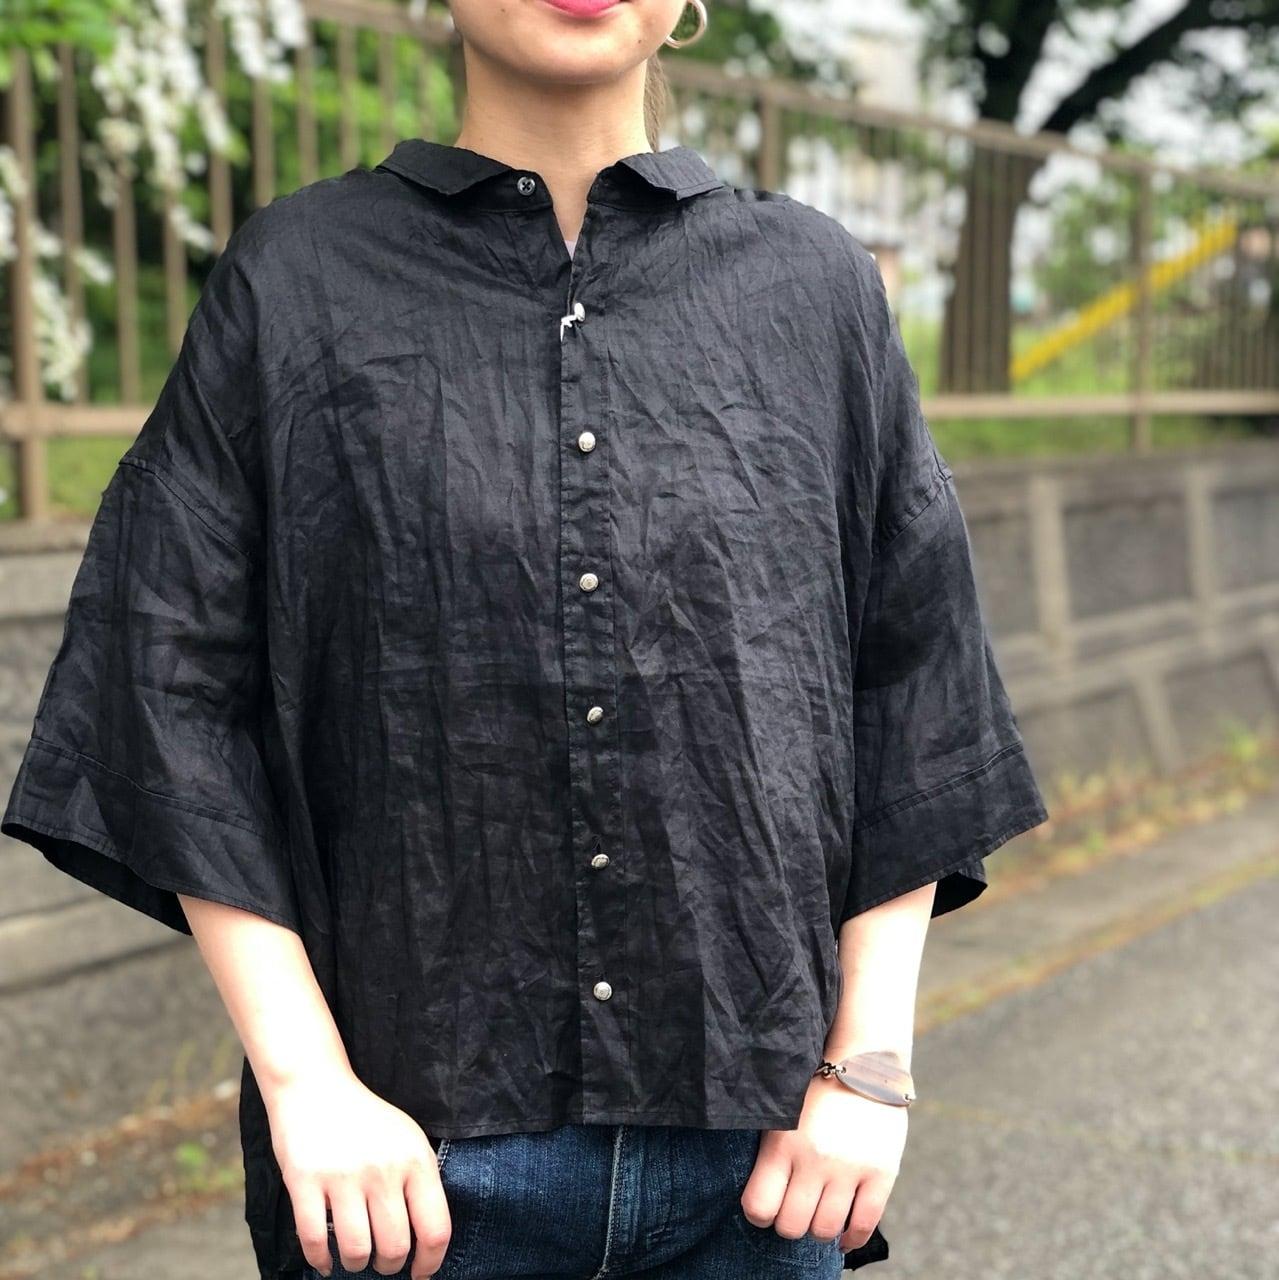 【 ANTGAUGE 】- GB253 - リネン六分丈シャツ